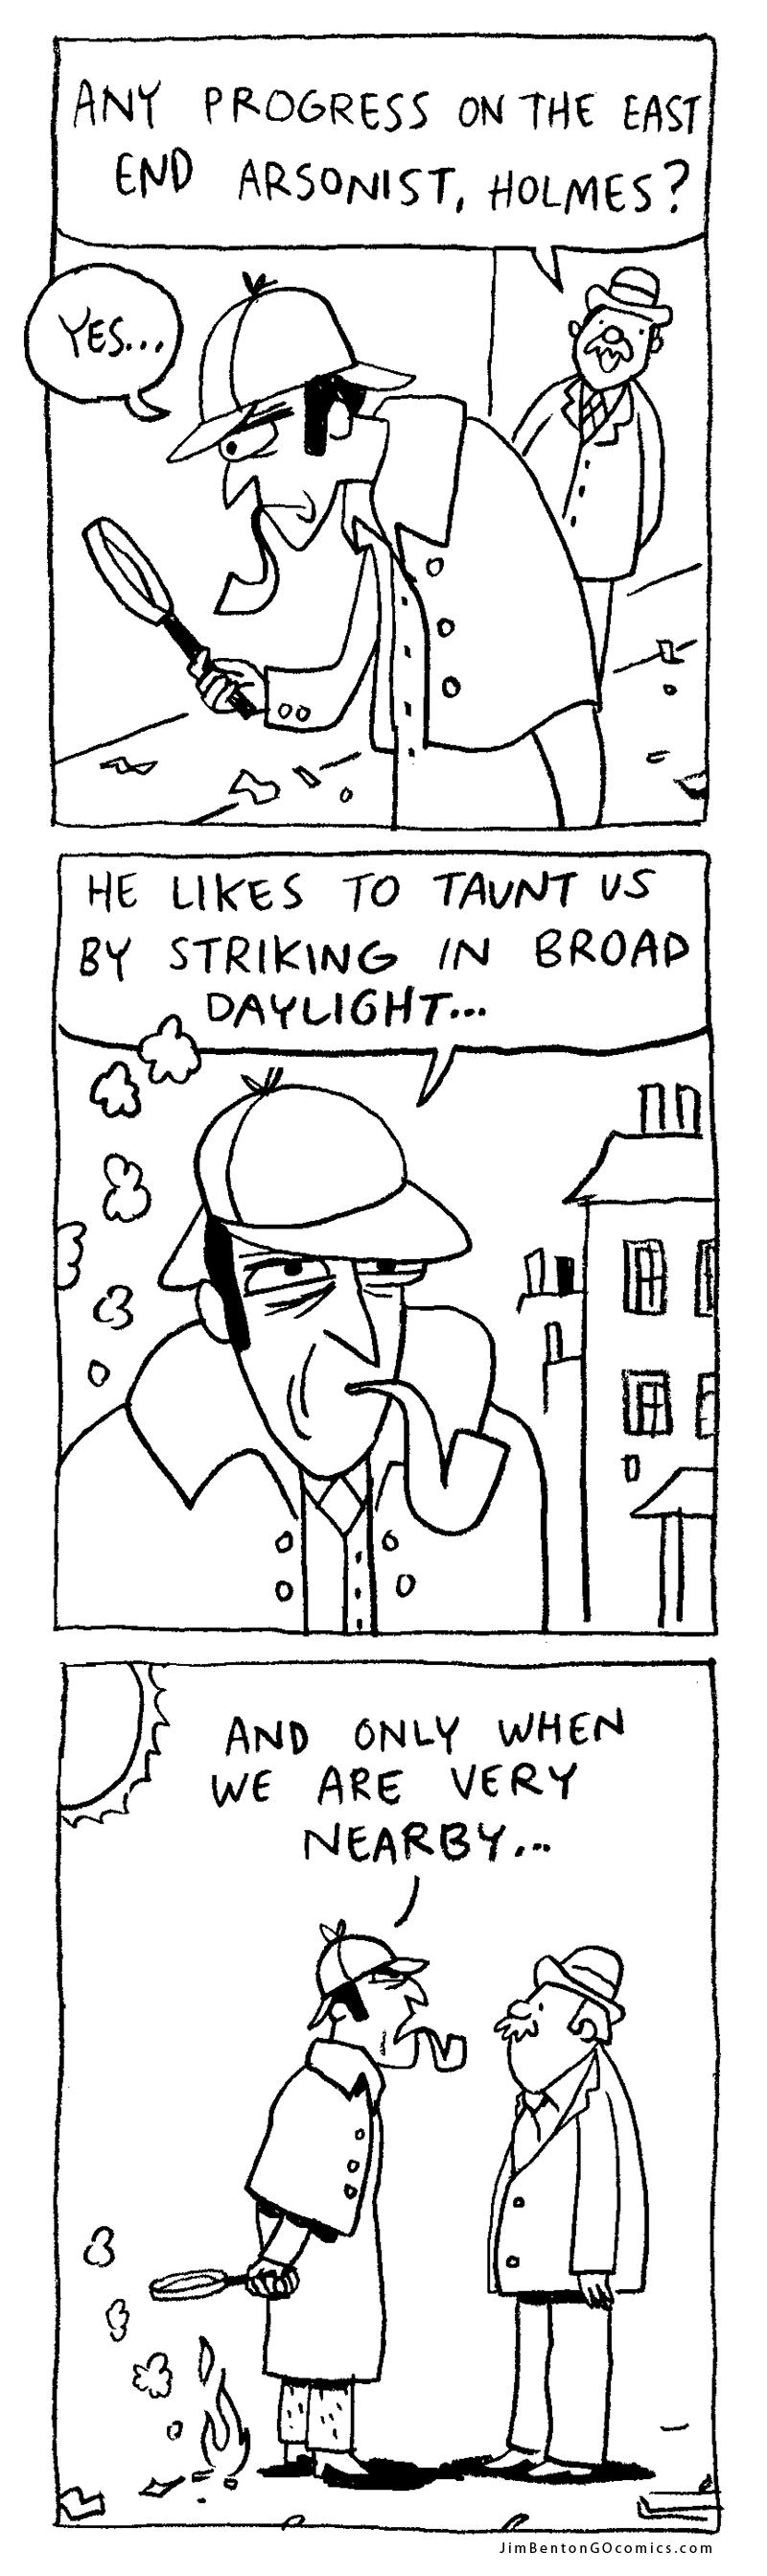 sherlock-holmes-web-comics-mystery-unsolved